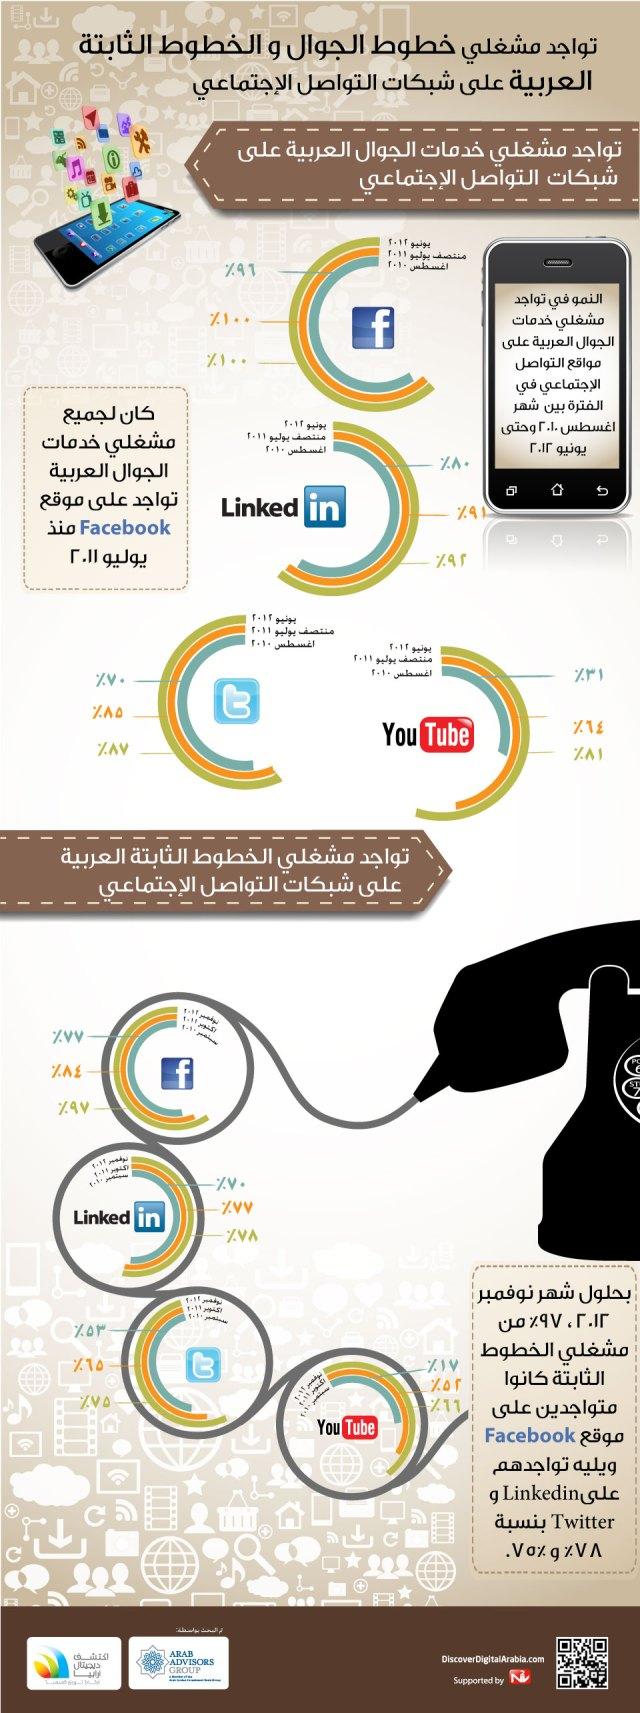 info-arabic-ver-NoMP (1)